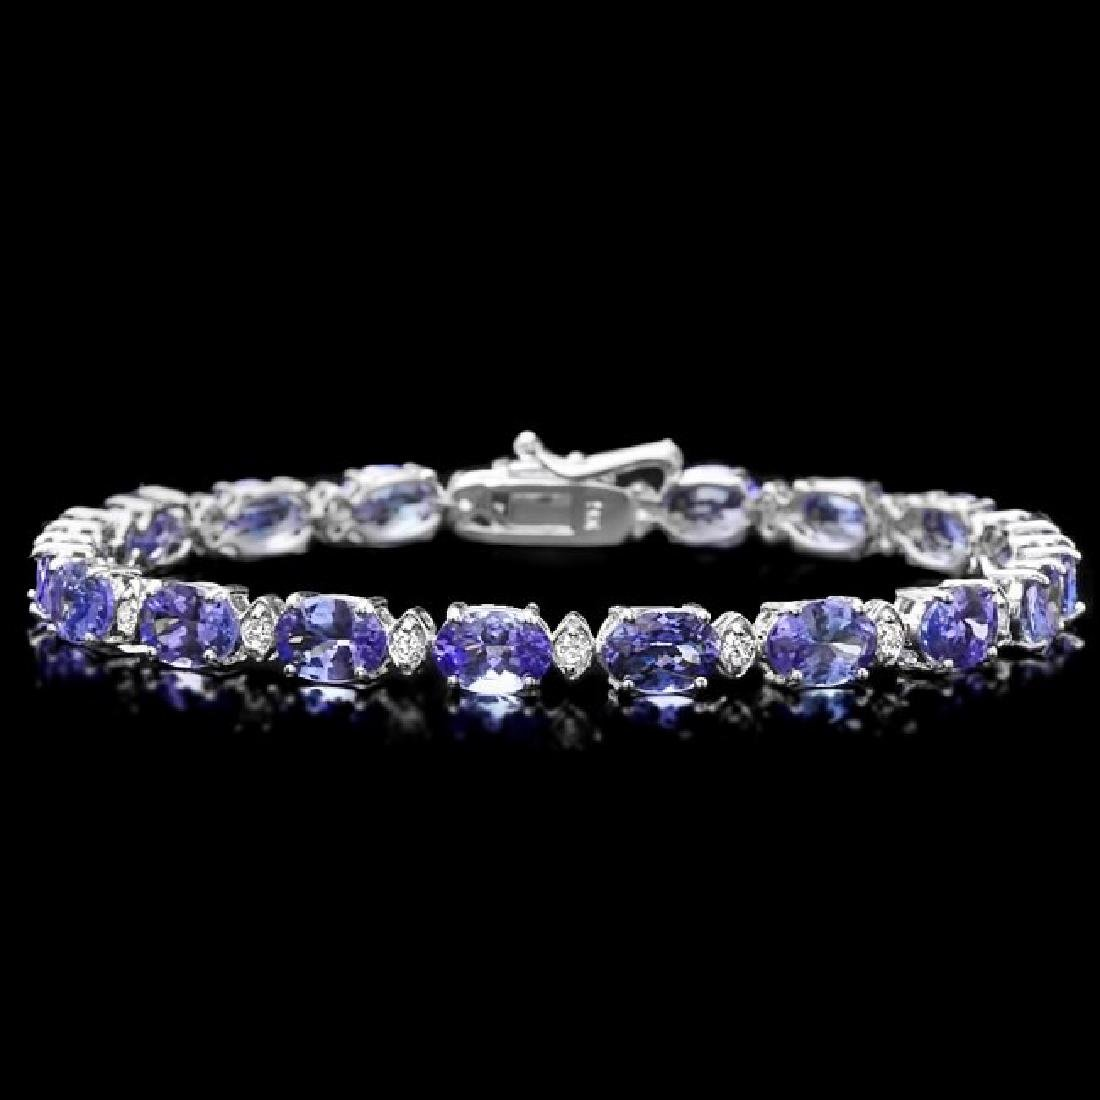 14k Gold 14ct Tanzanite 0.60ct Diamond Bracelet